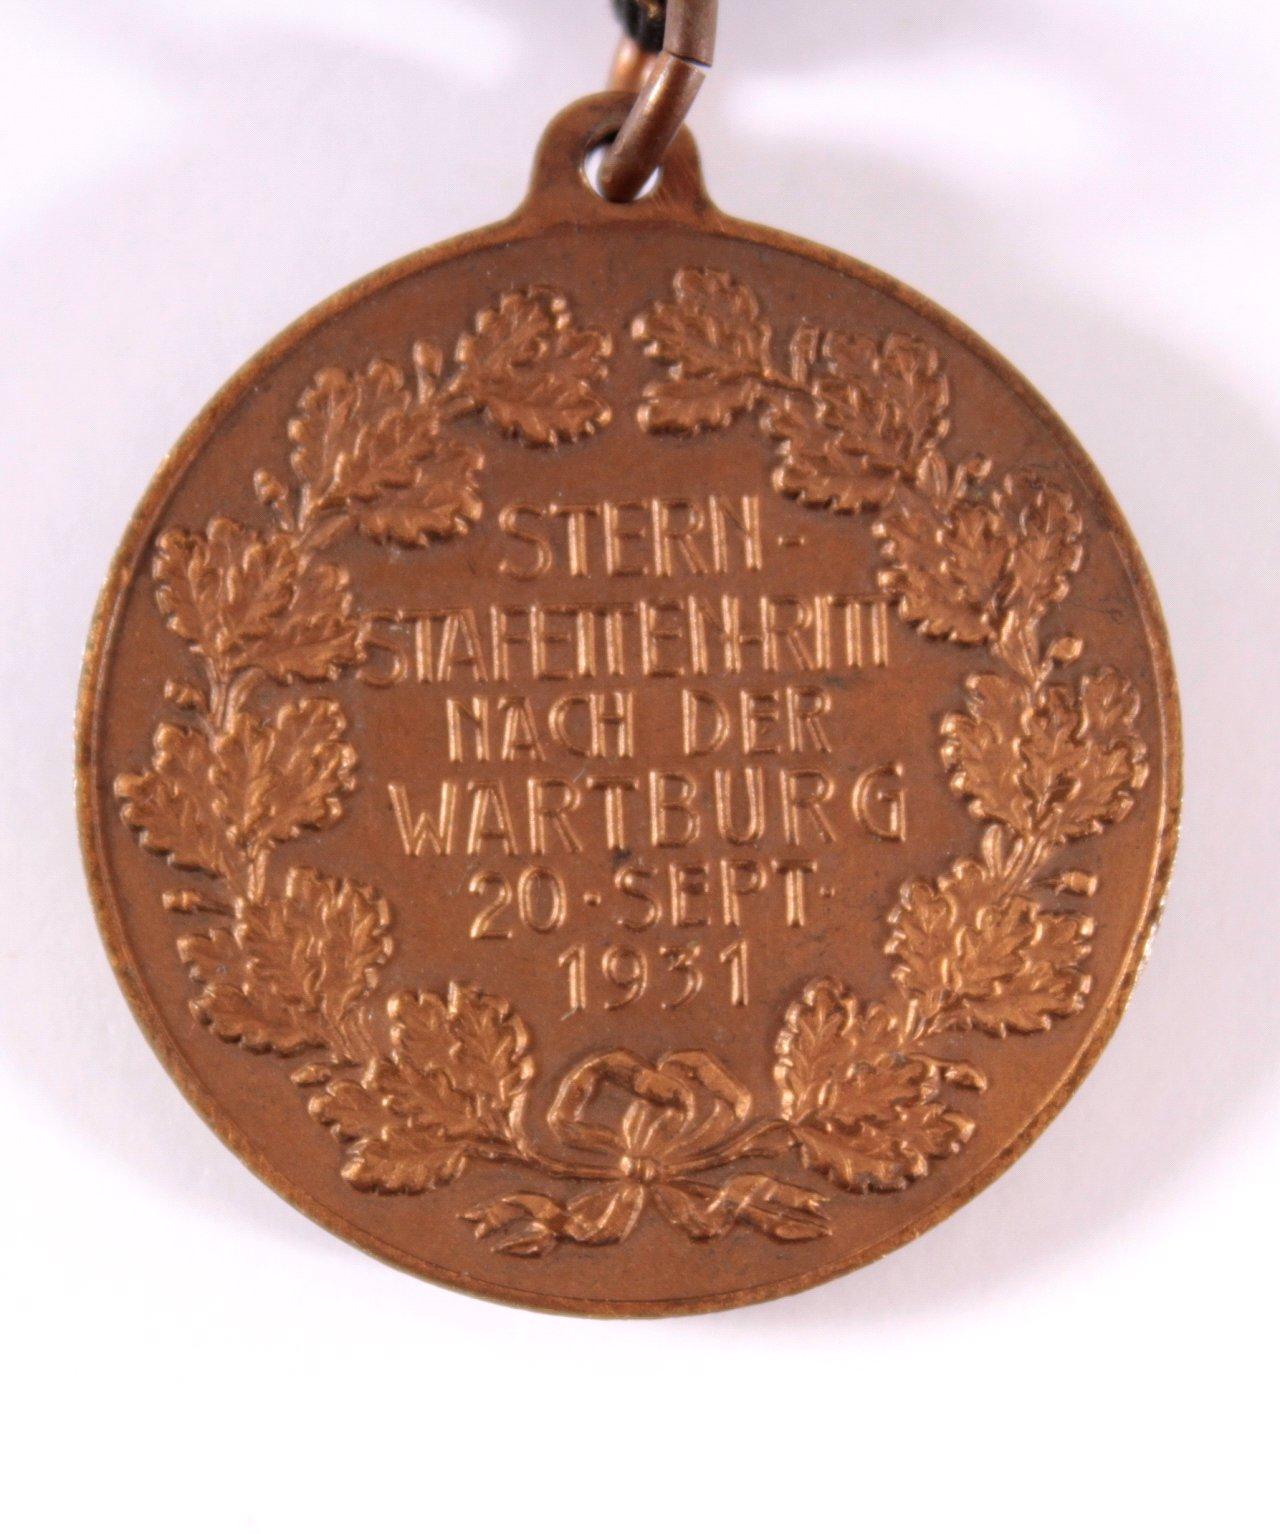 Medaille Stern Staffetten Ritt, Eisenach 1931-2